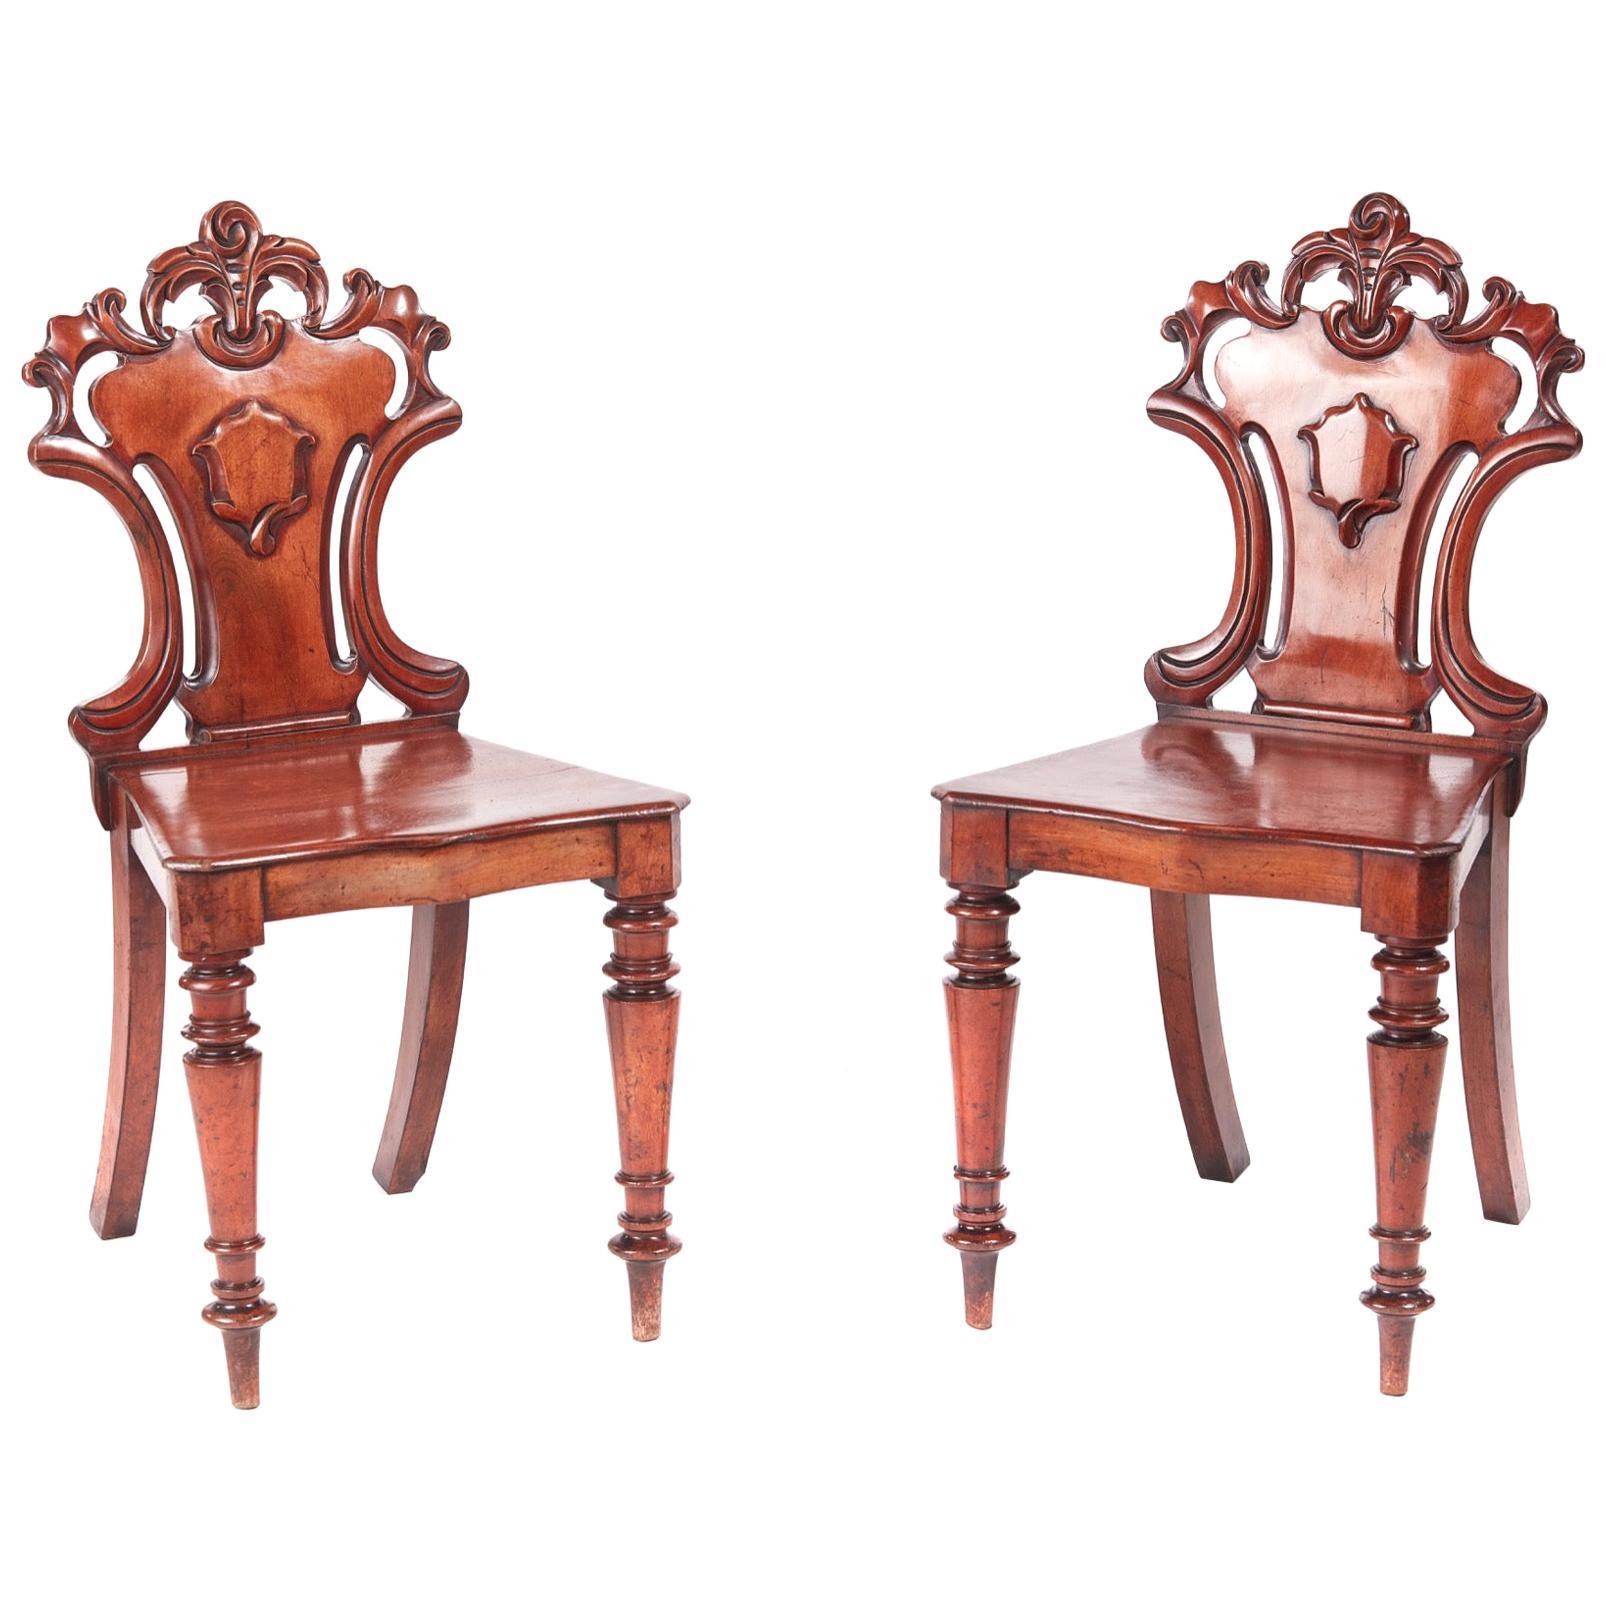 Antique Pair of William IV Mahogany Hall Chairs